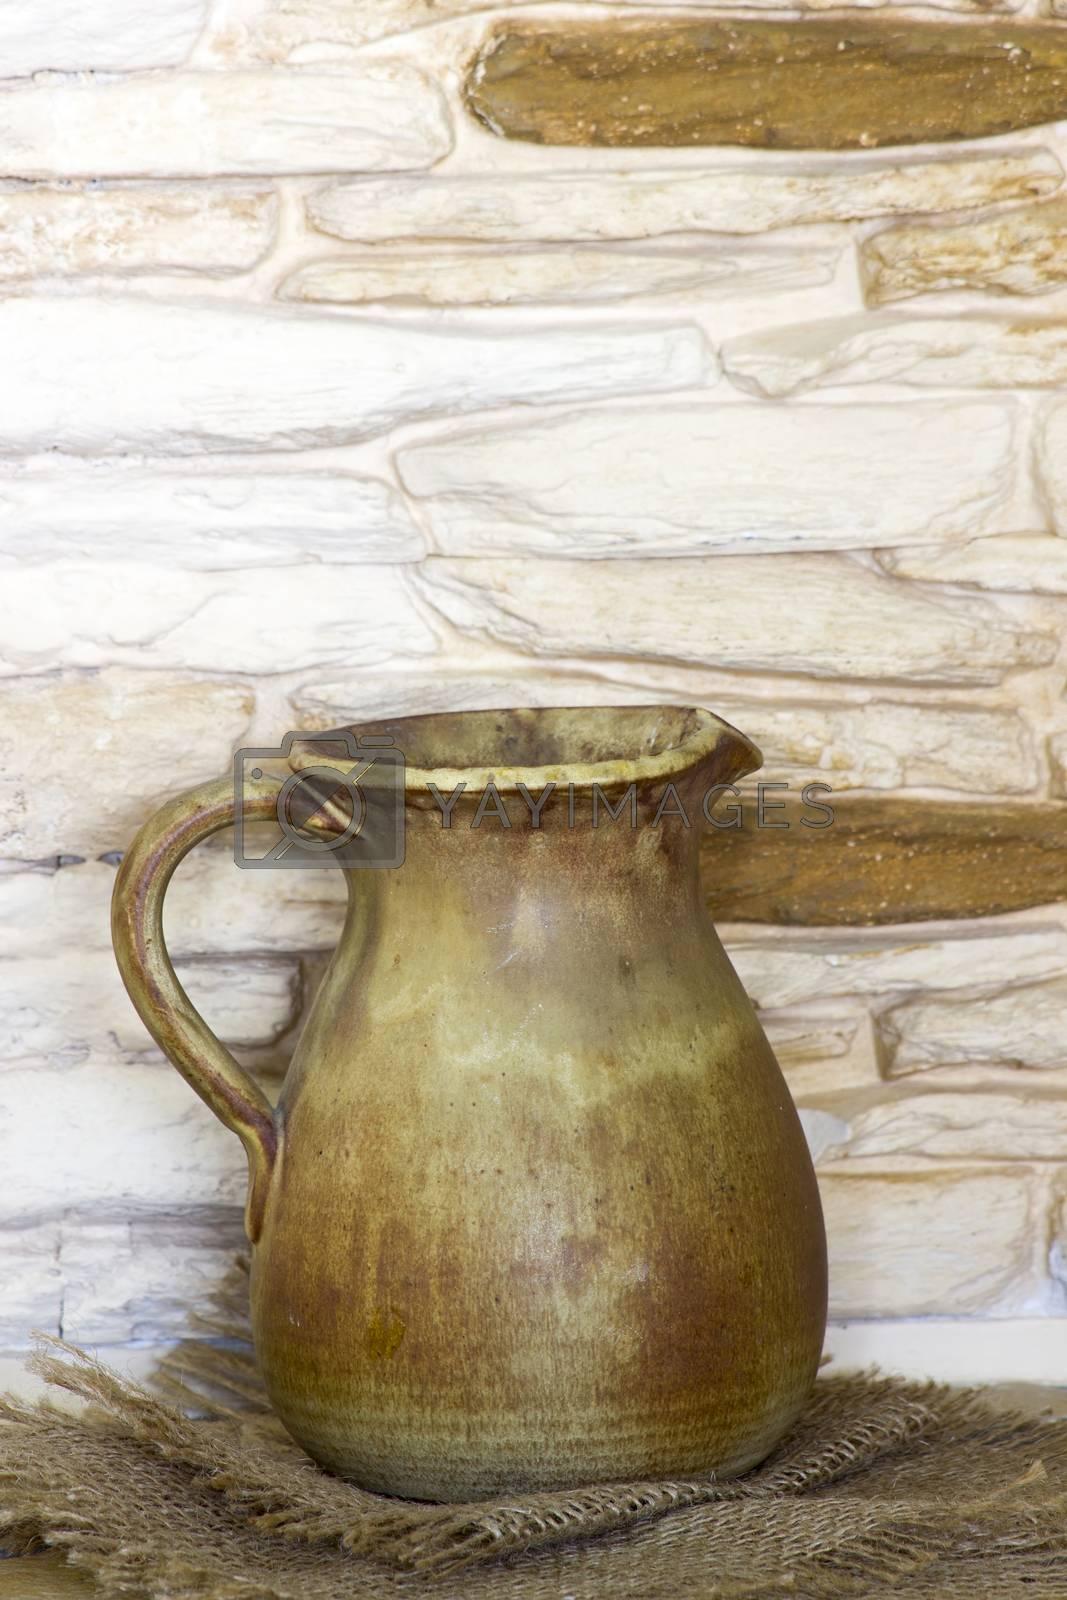 Clay jug, old ceramic vase